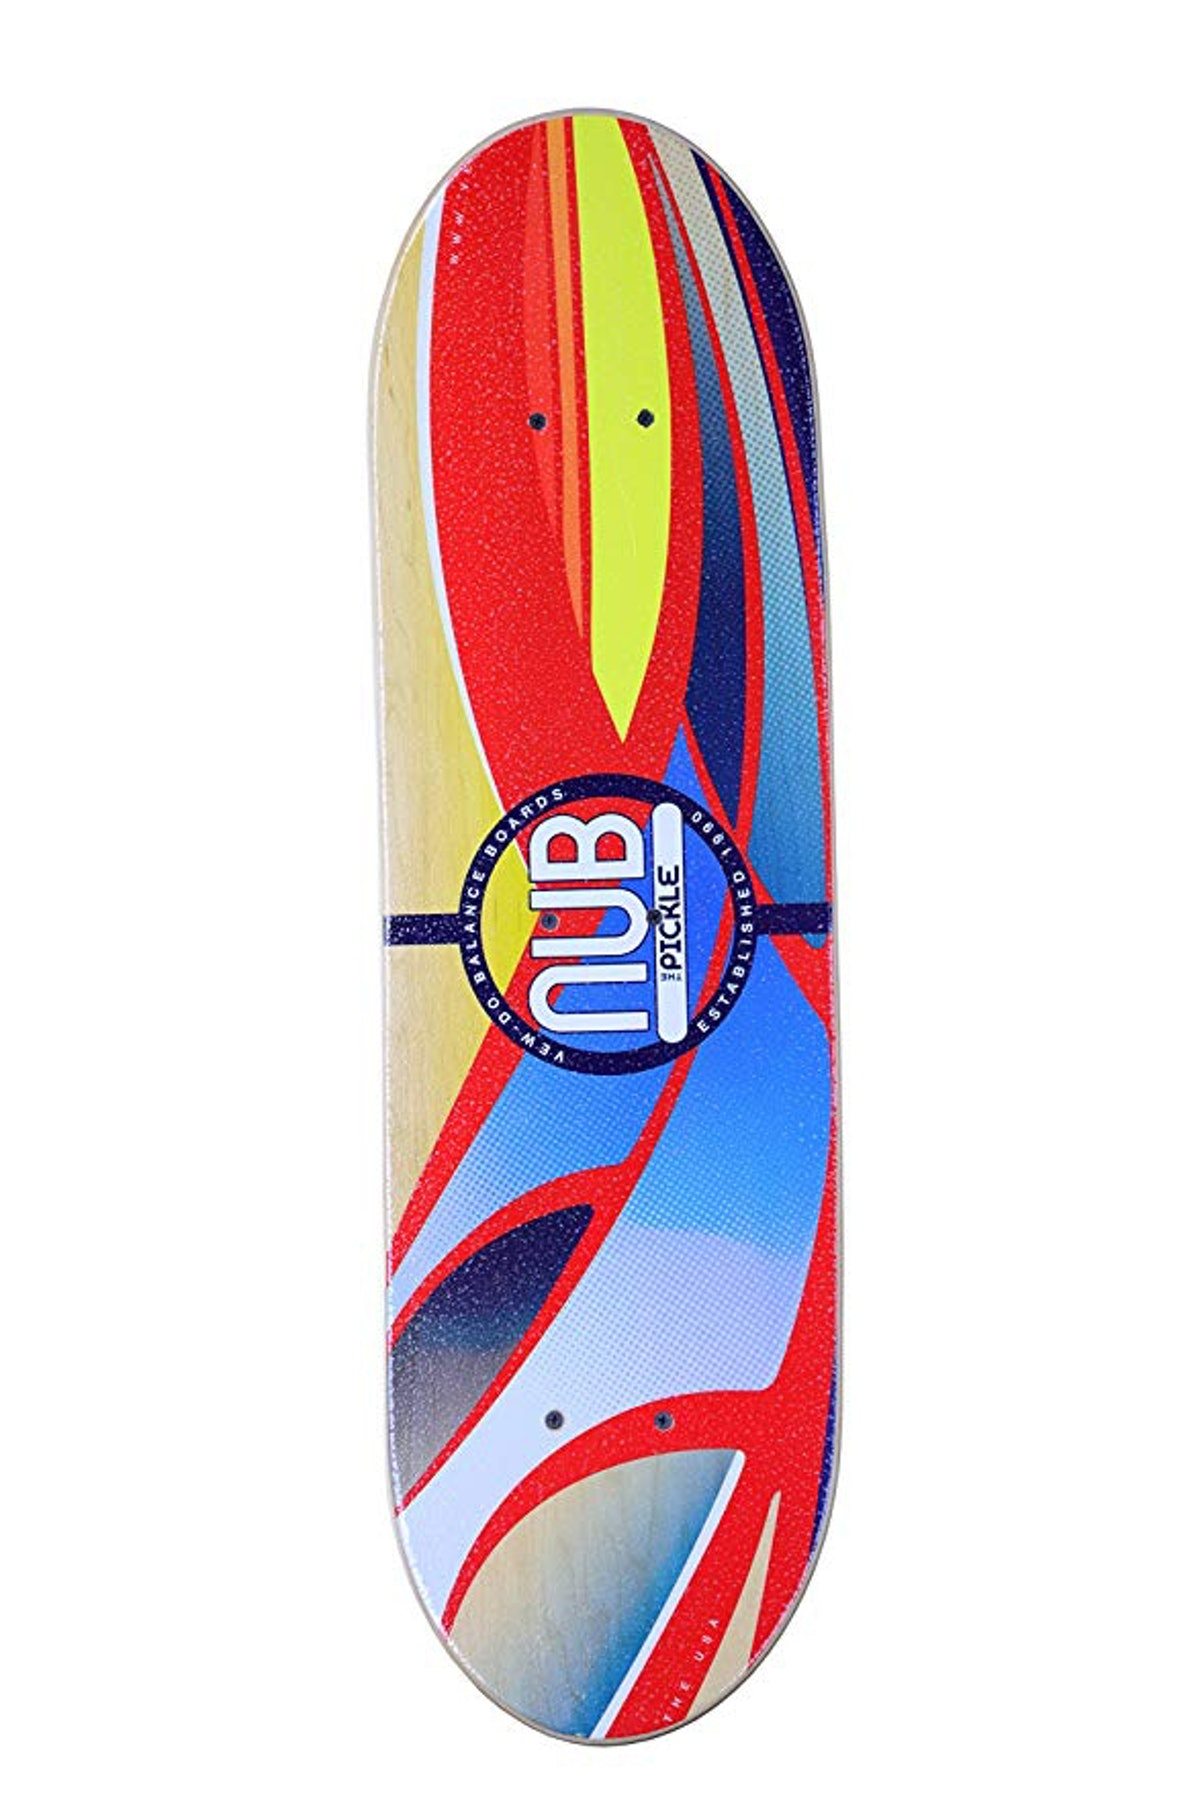 WODFitters Vew-Do NUB Balance Board